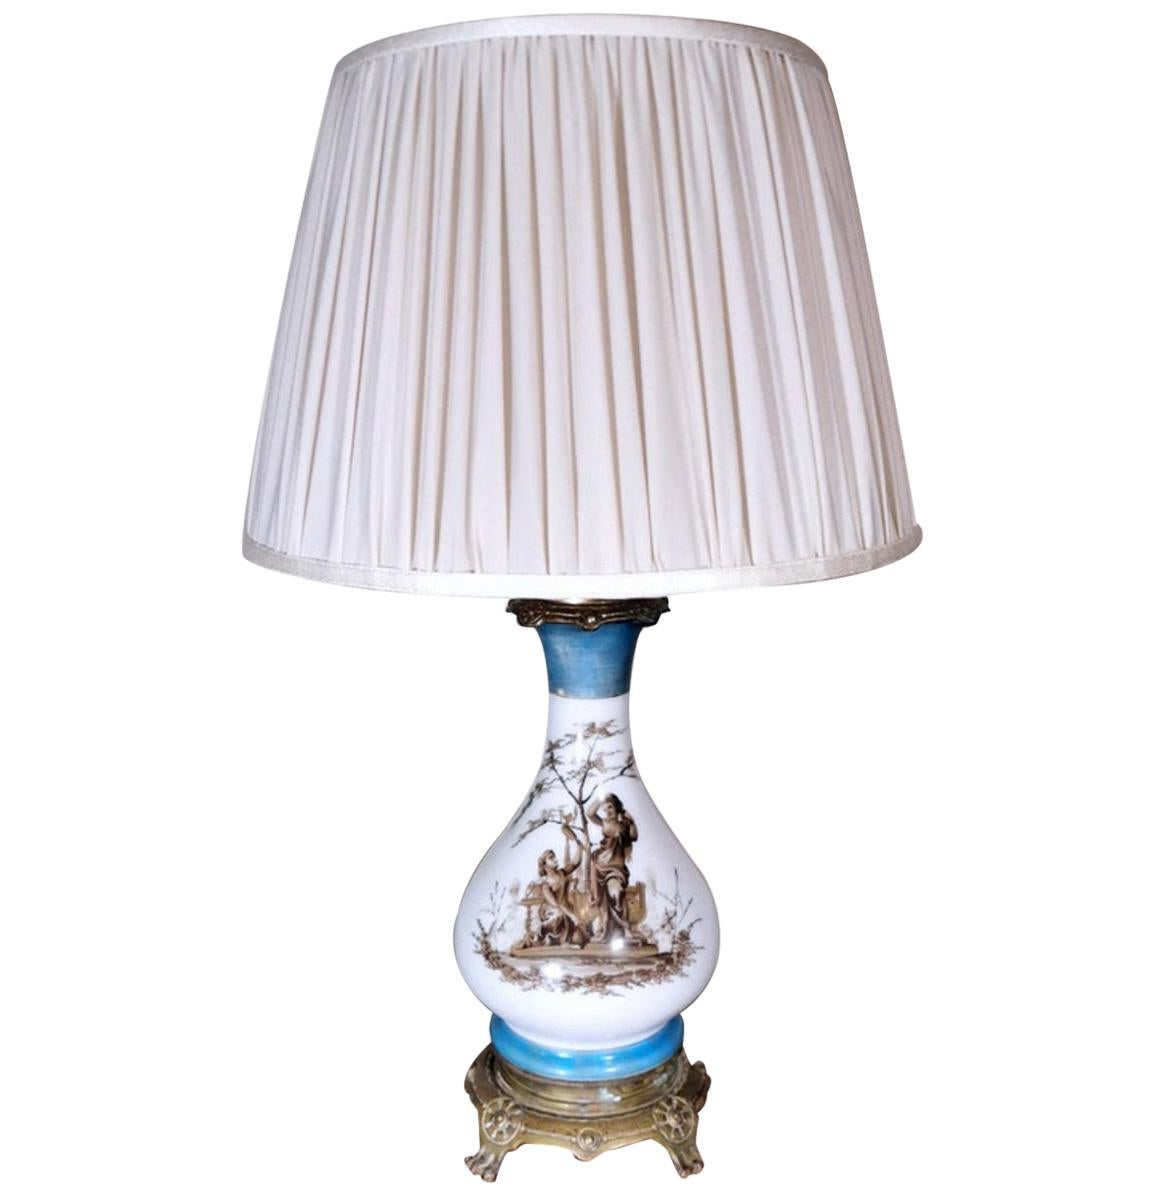 Porcelain De Paris Table Lamp Napoleon III France 'Without Lampshade'